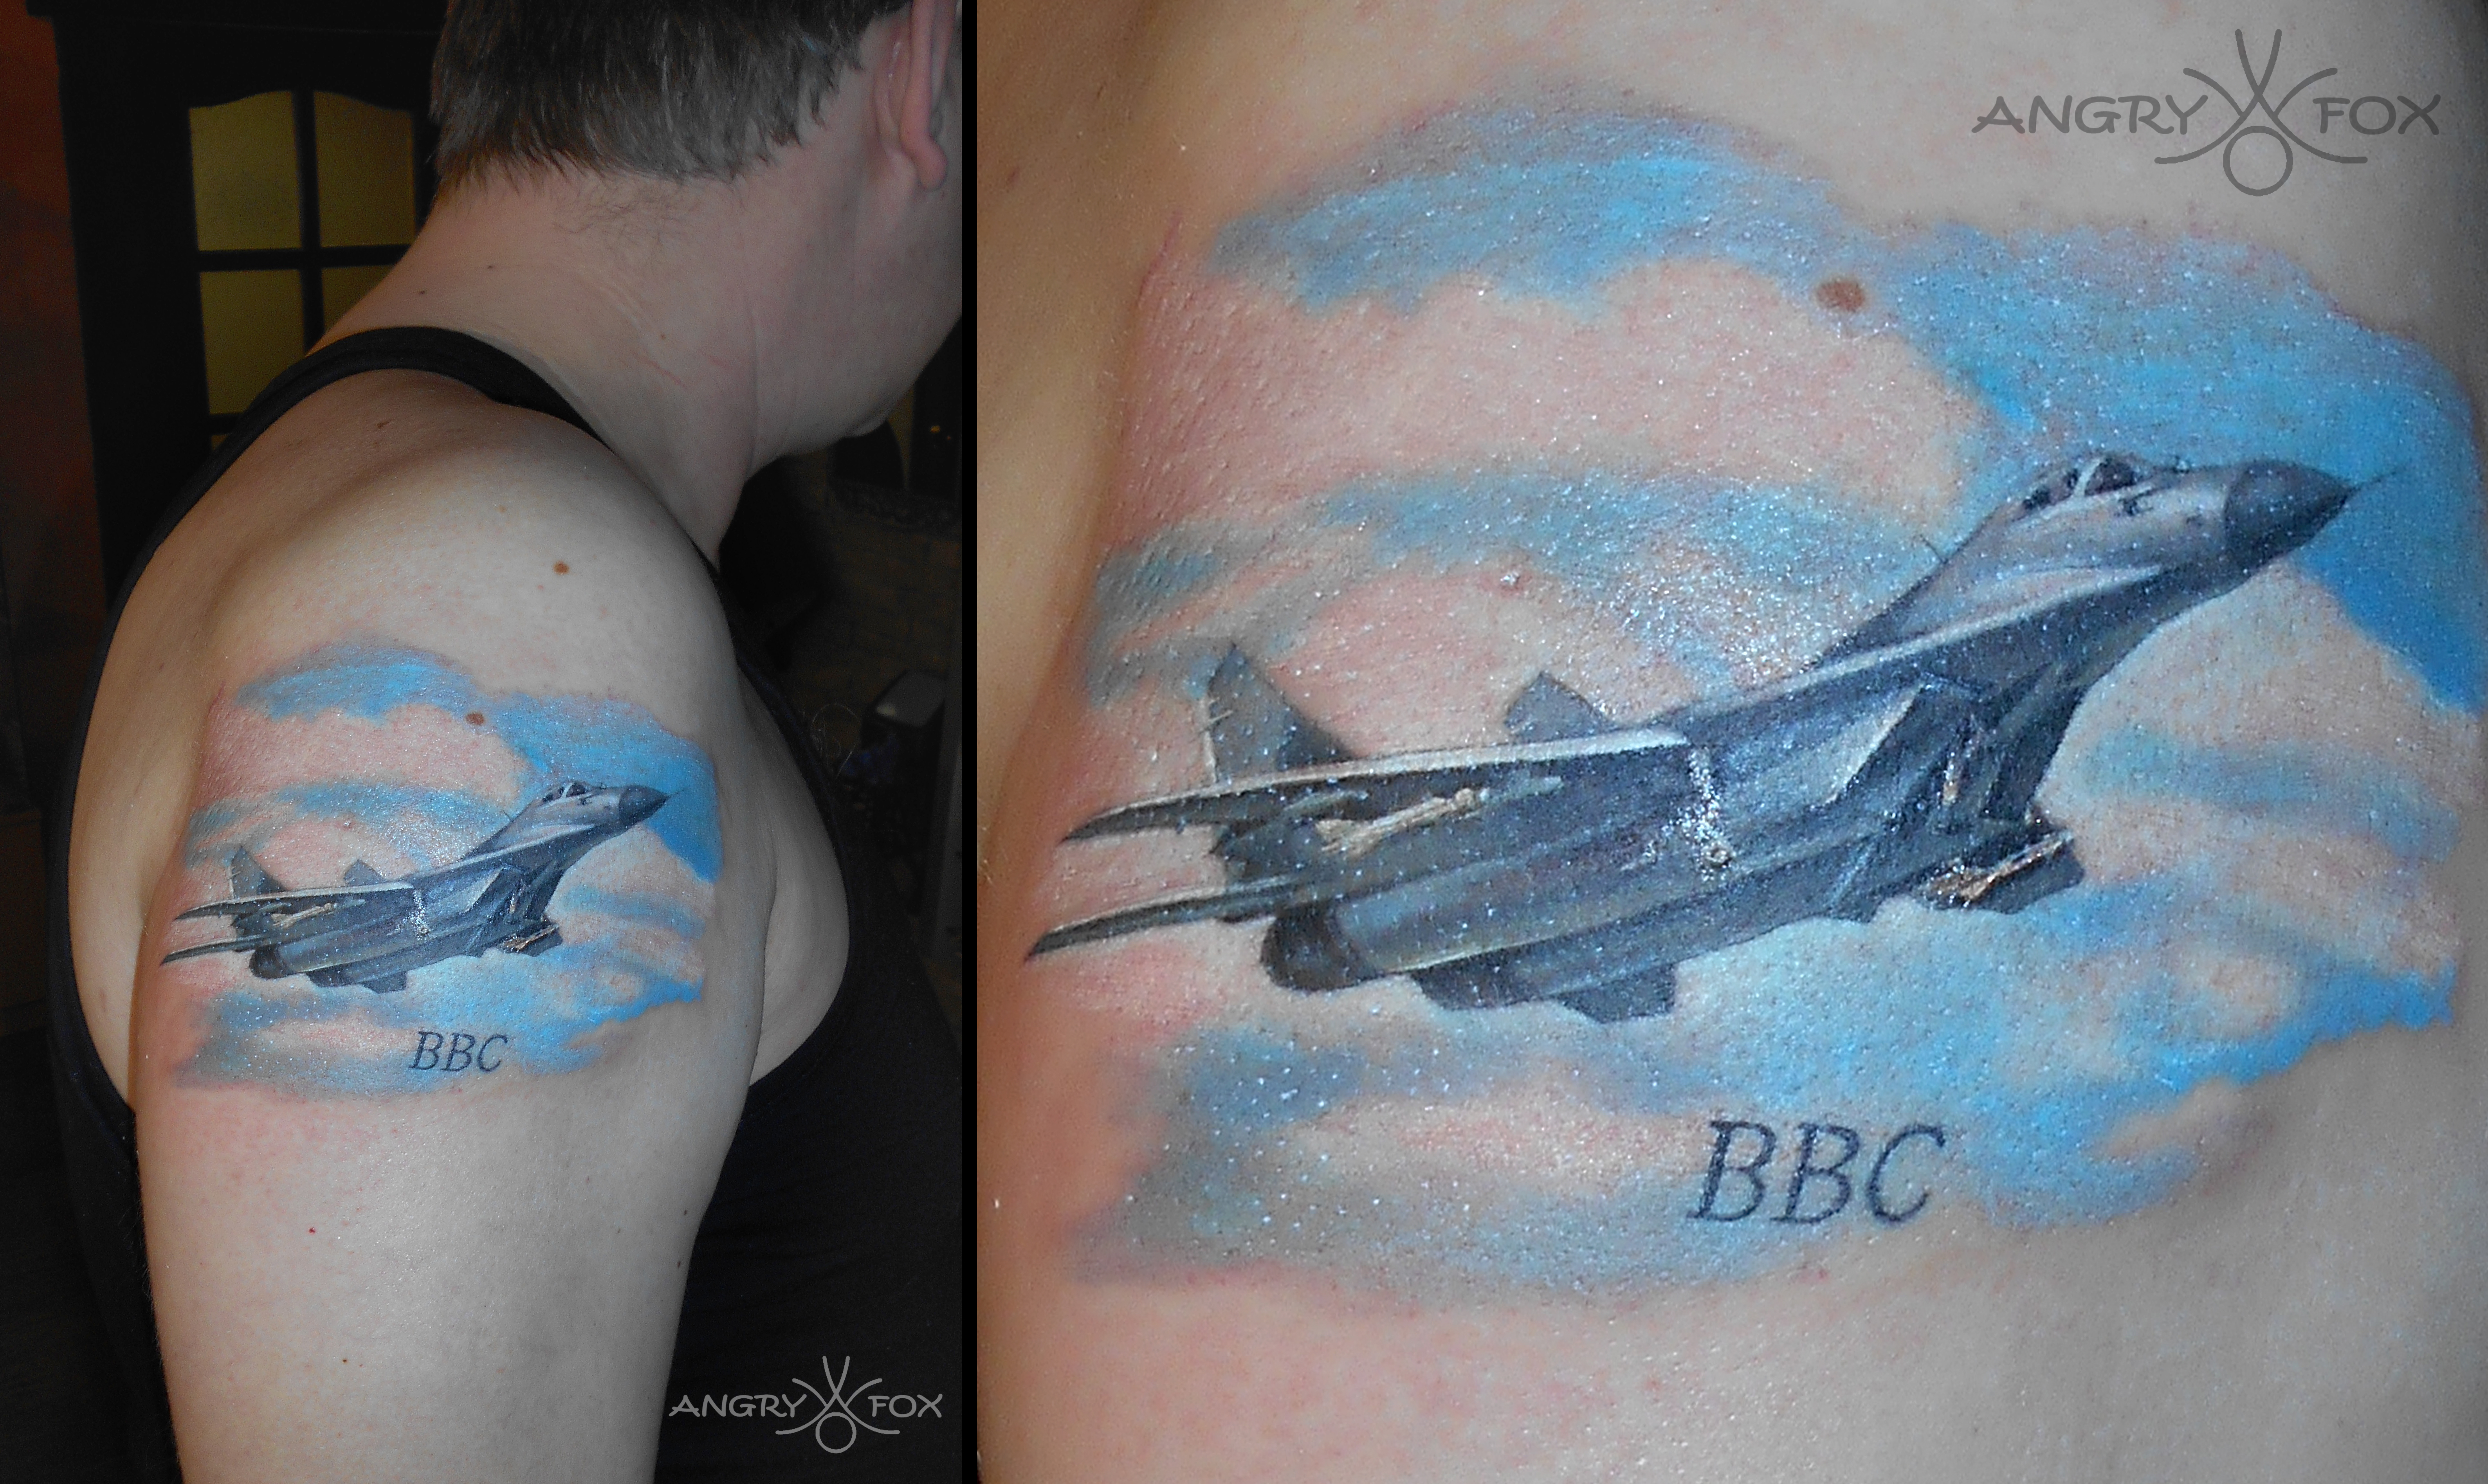 Superiore армейские татуировки ввс